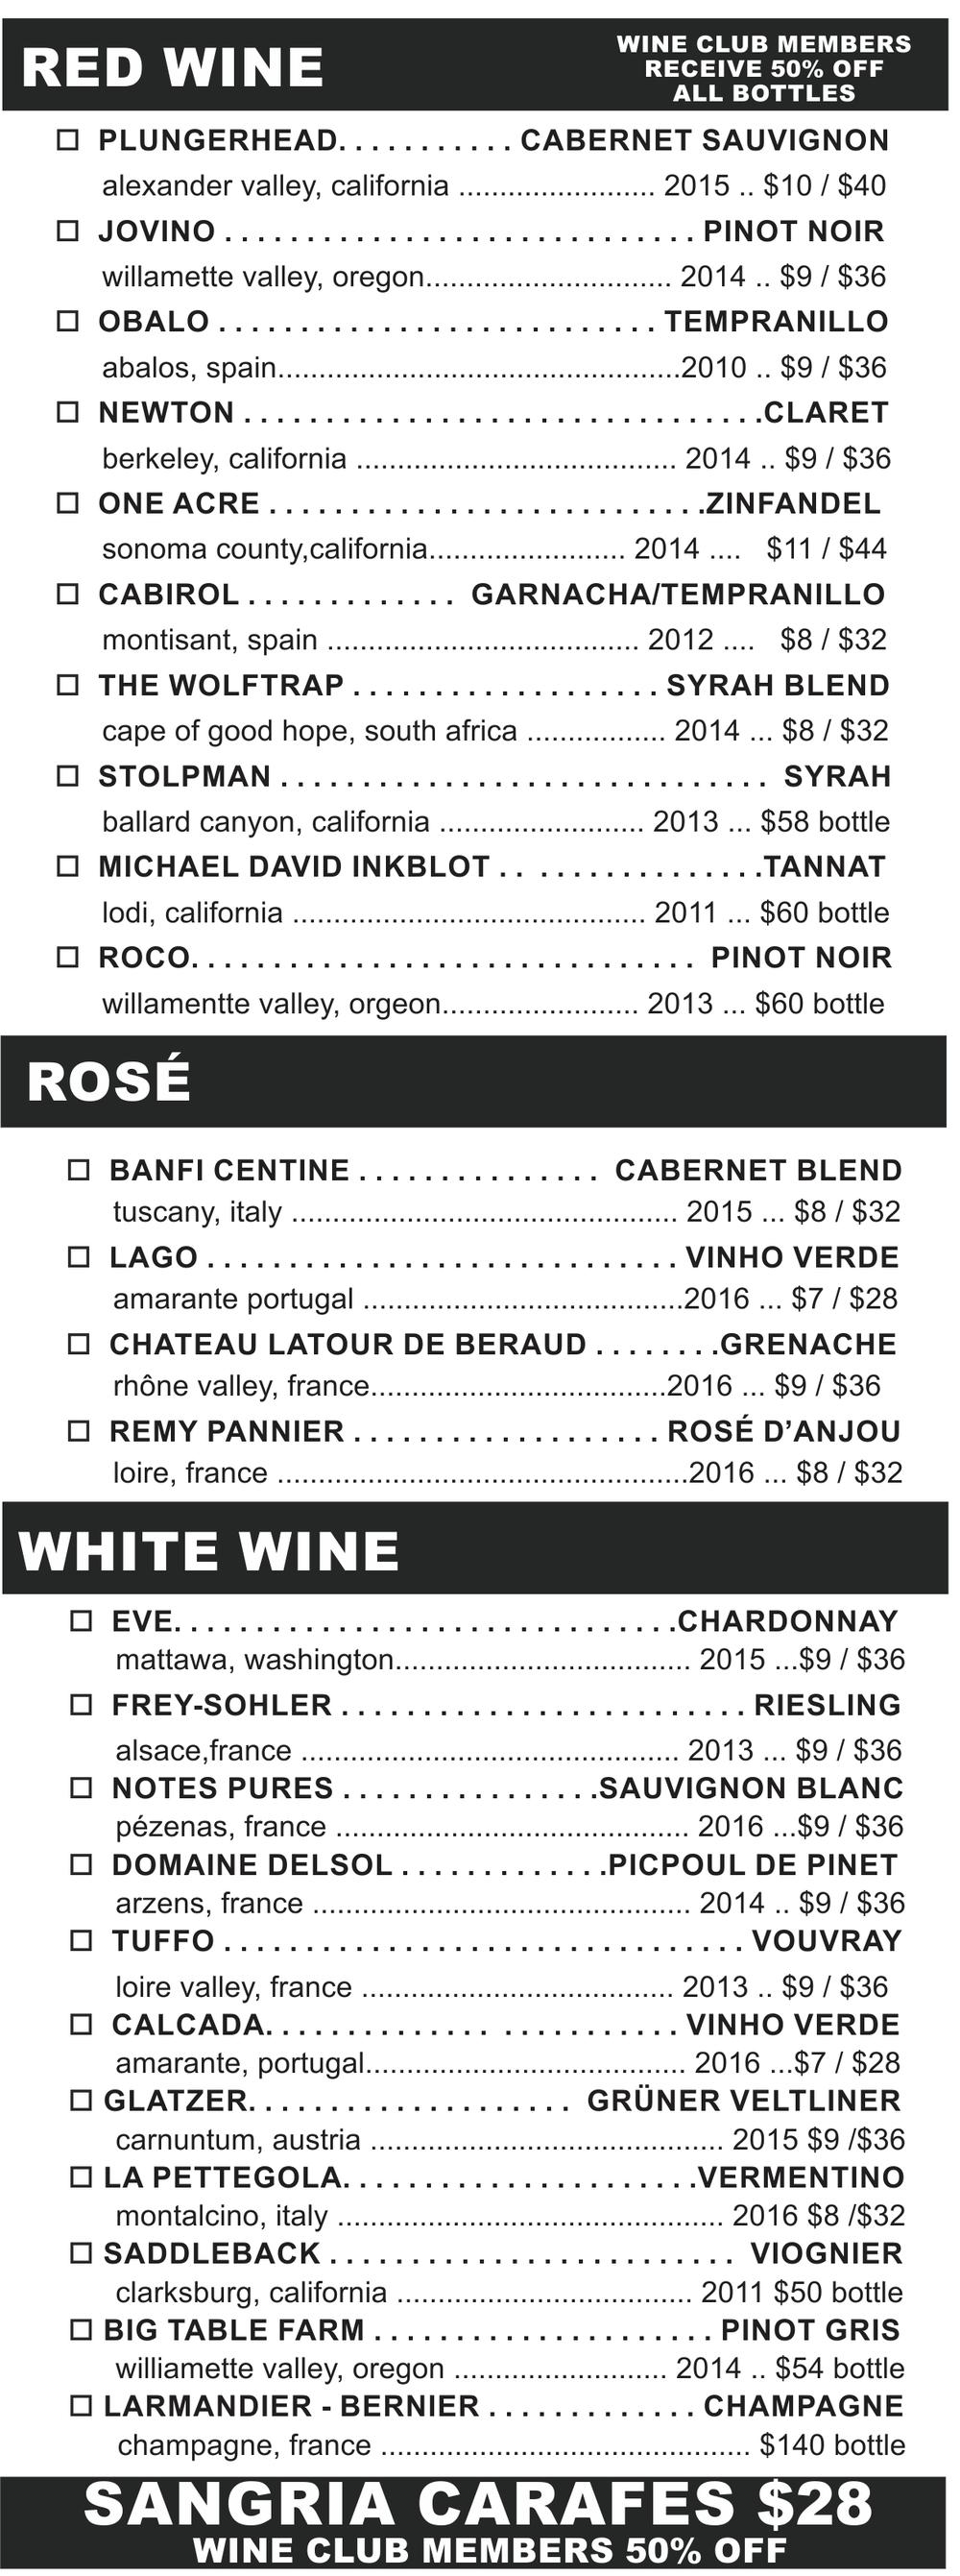 wine insert 9-21-17.png